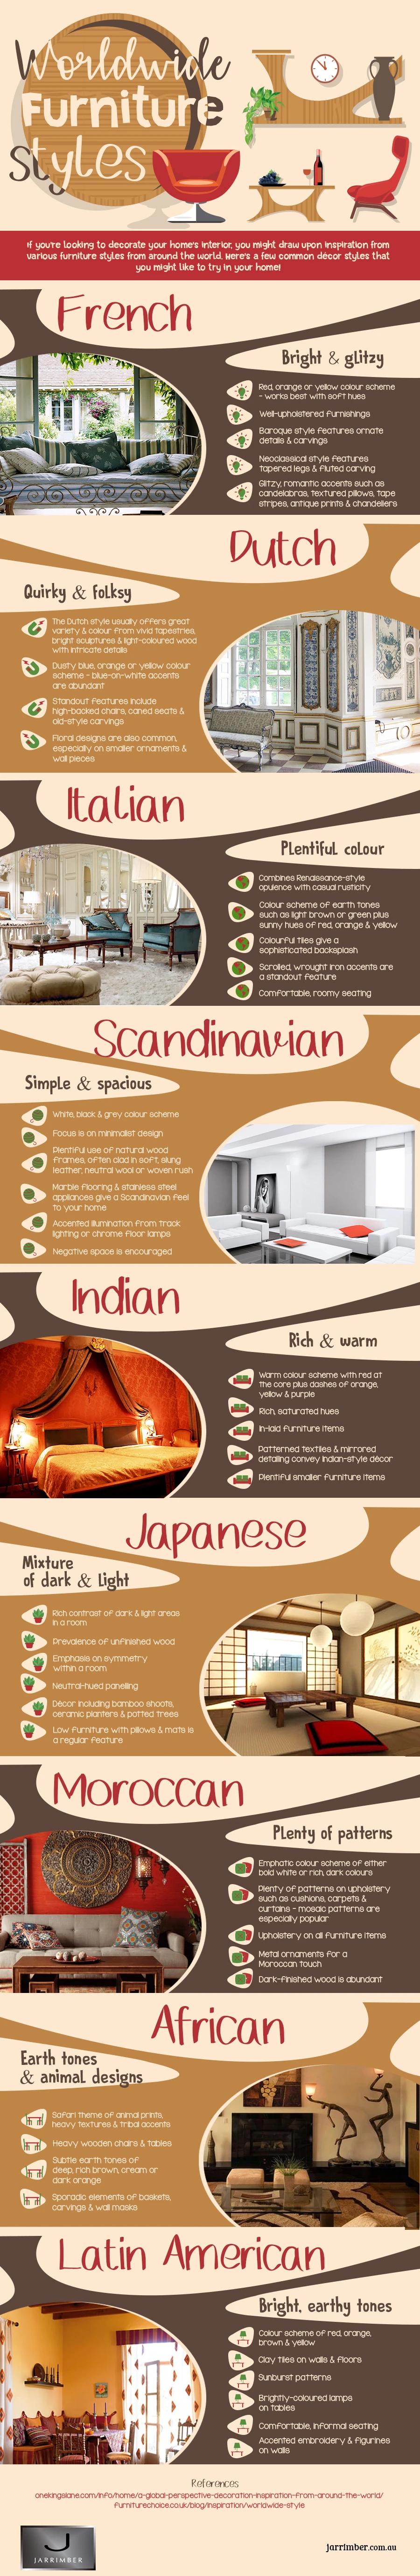 Worldwide Furniture Styles